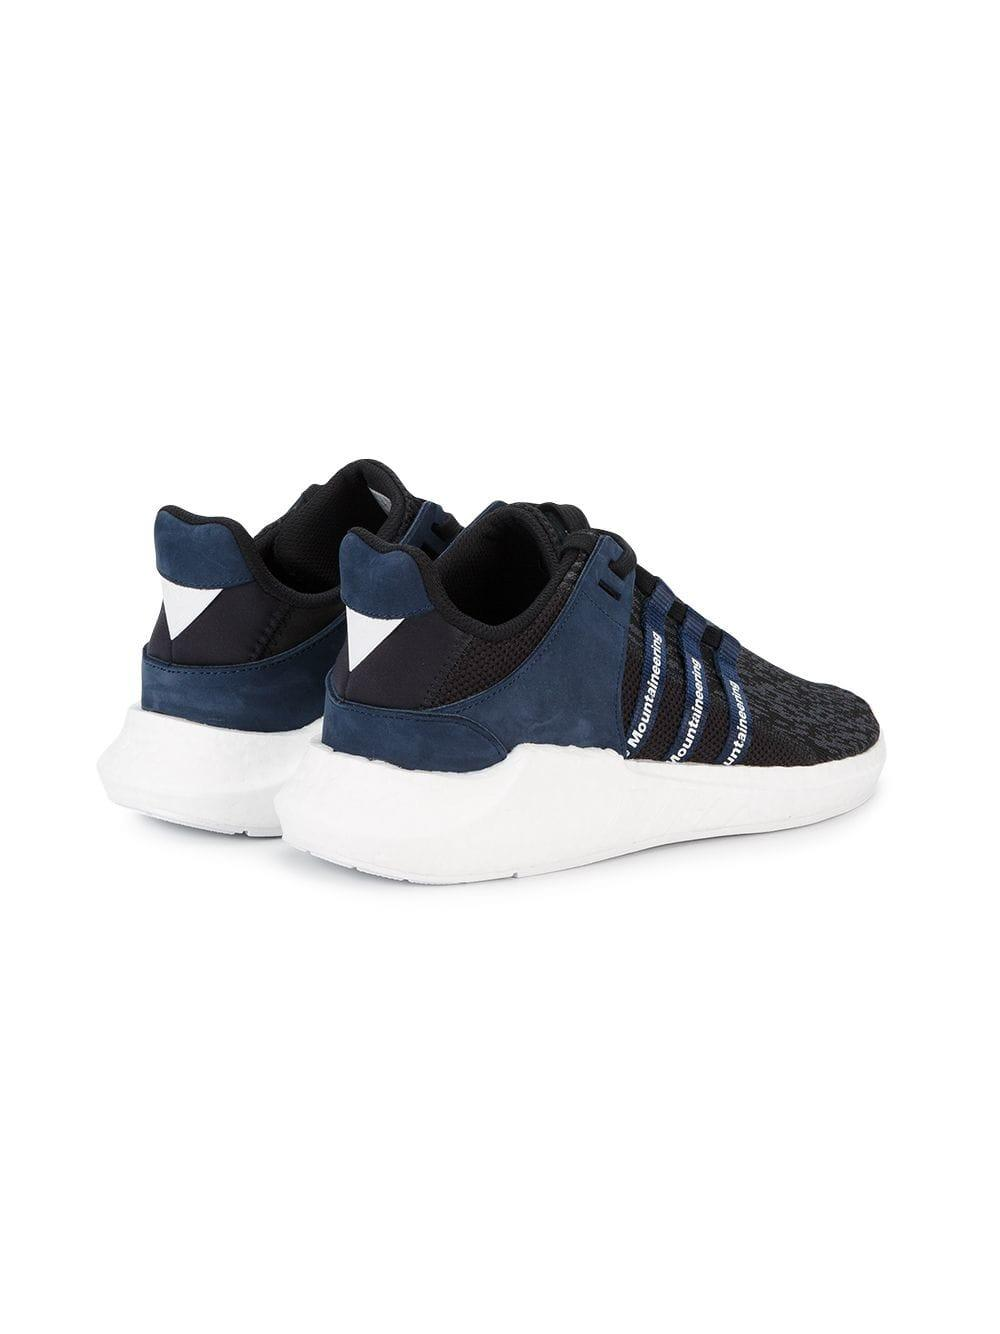 Zapatillas EQT Support Future Boost adidas de Ante de color Azul para hombre